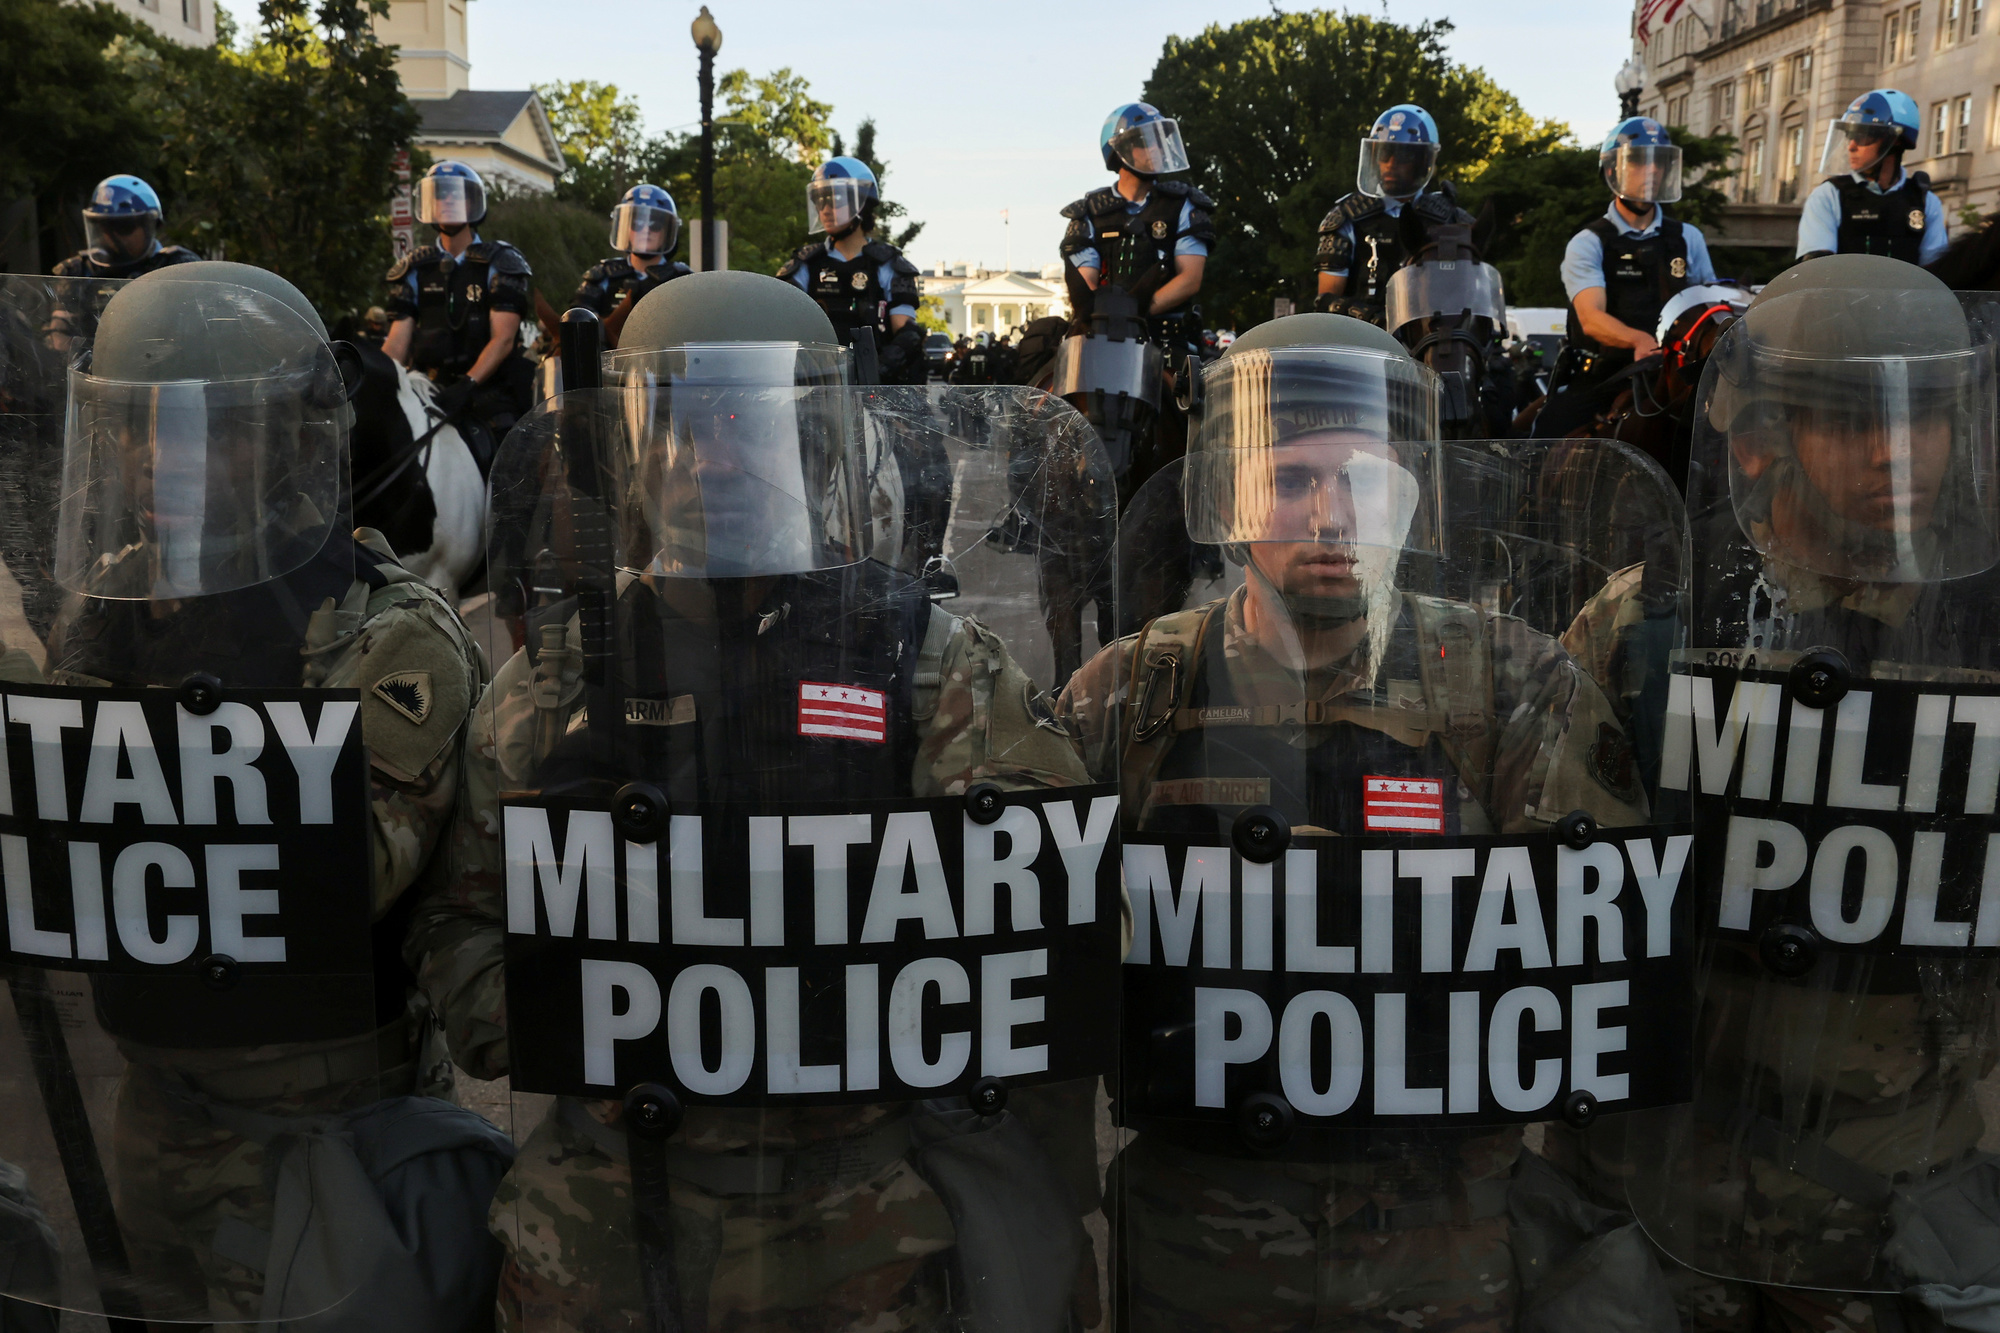 Militaire politie komt tussen in hoofdstad Washington, Reuters